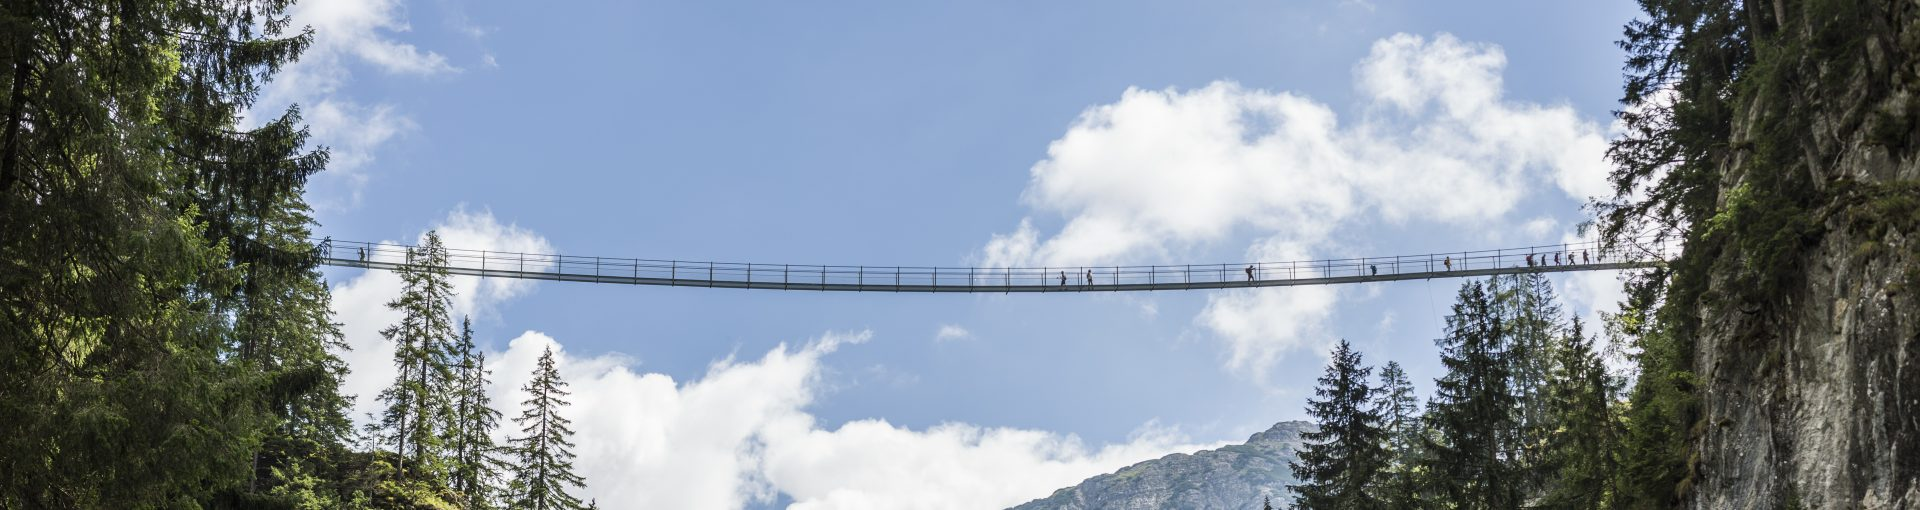 Hängebrücke Holzgau © Tirol Werbung